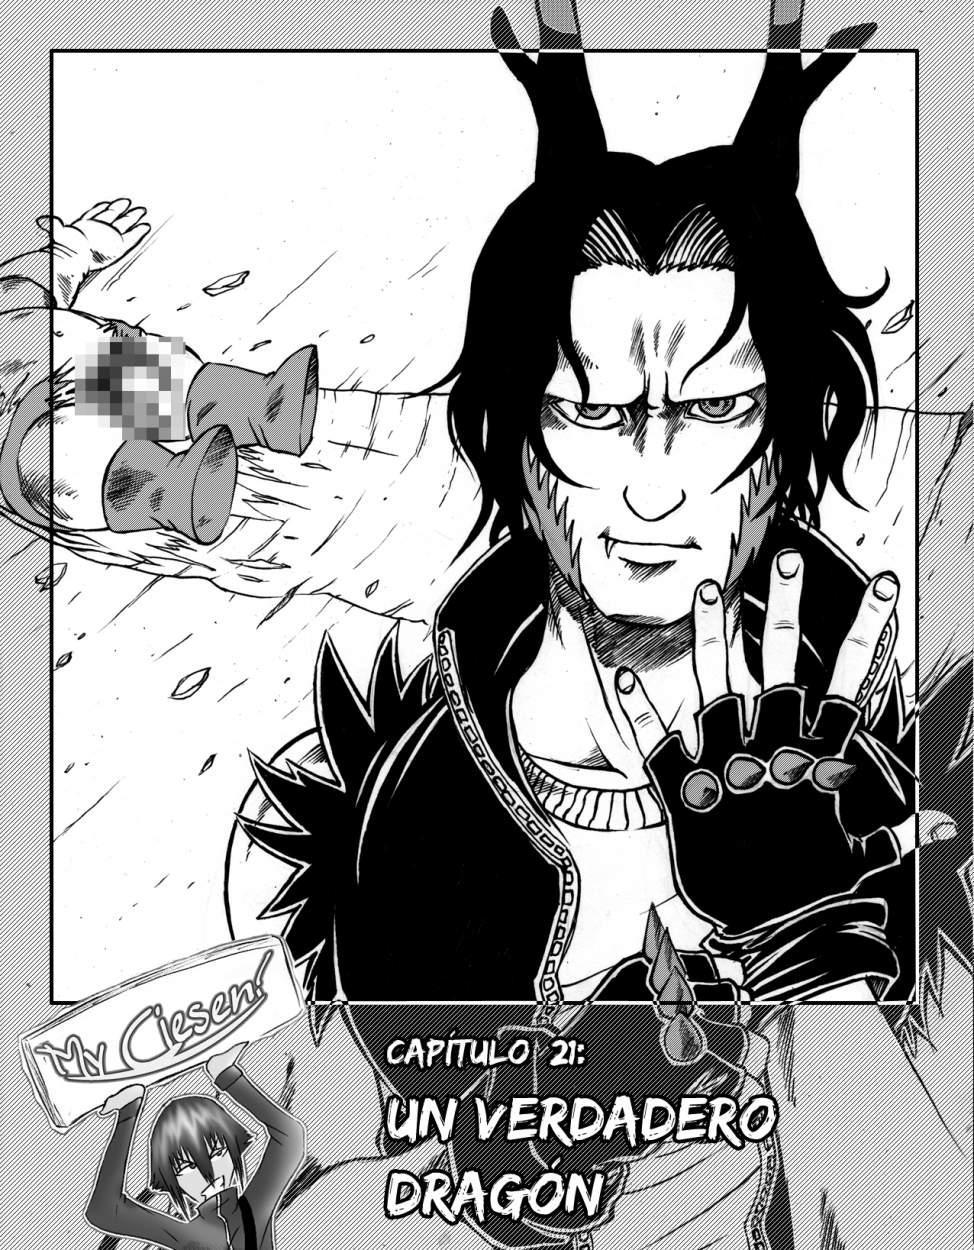 https://c5.ninemanga.com/es_manga/4/2884/445081/445081_1_156.jpg Page 1